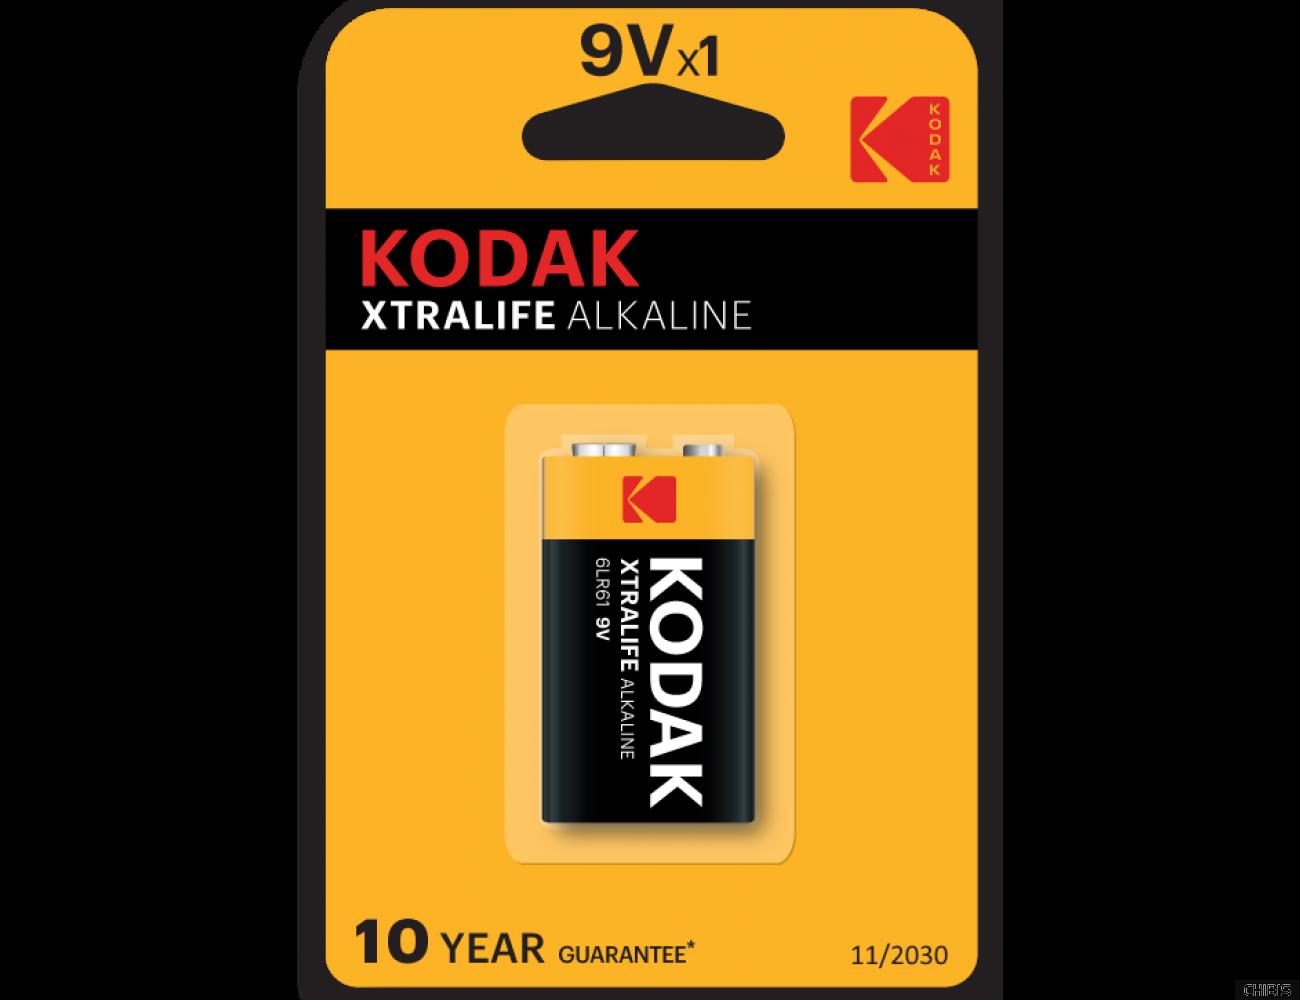 Батарейка Kodak 9V Крона XtraLife alkaline 6LR61 1шт.